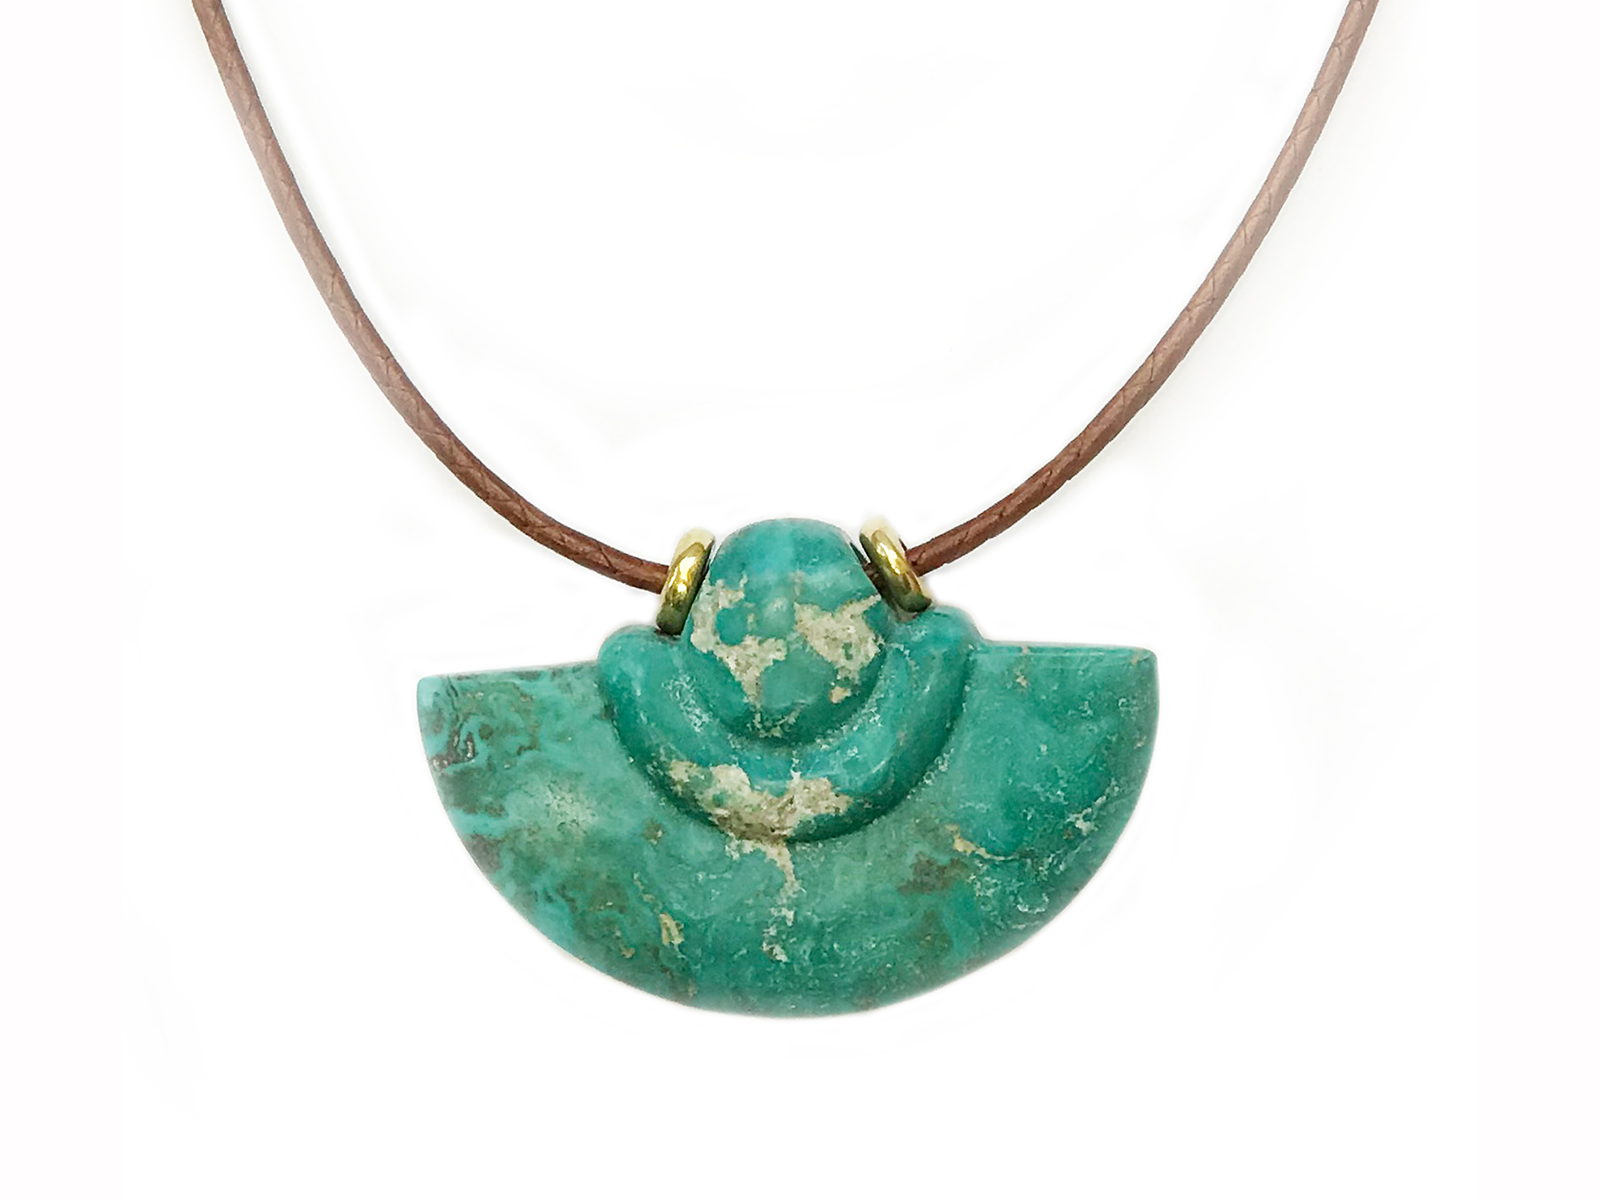 Turquoise Mountain Axe Pendant